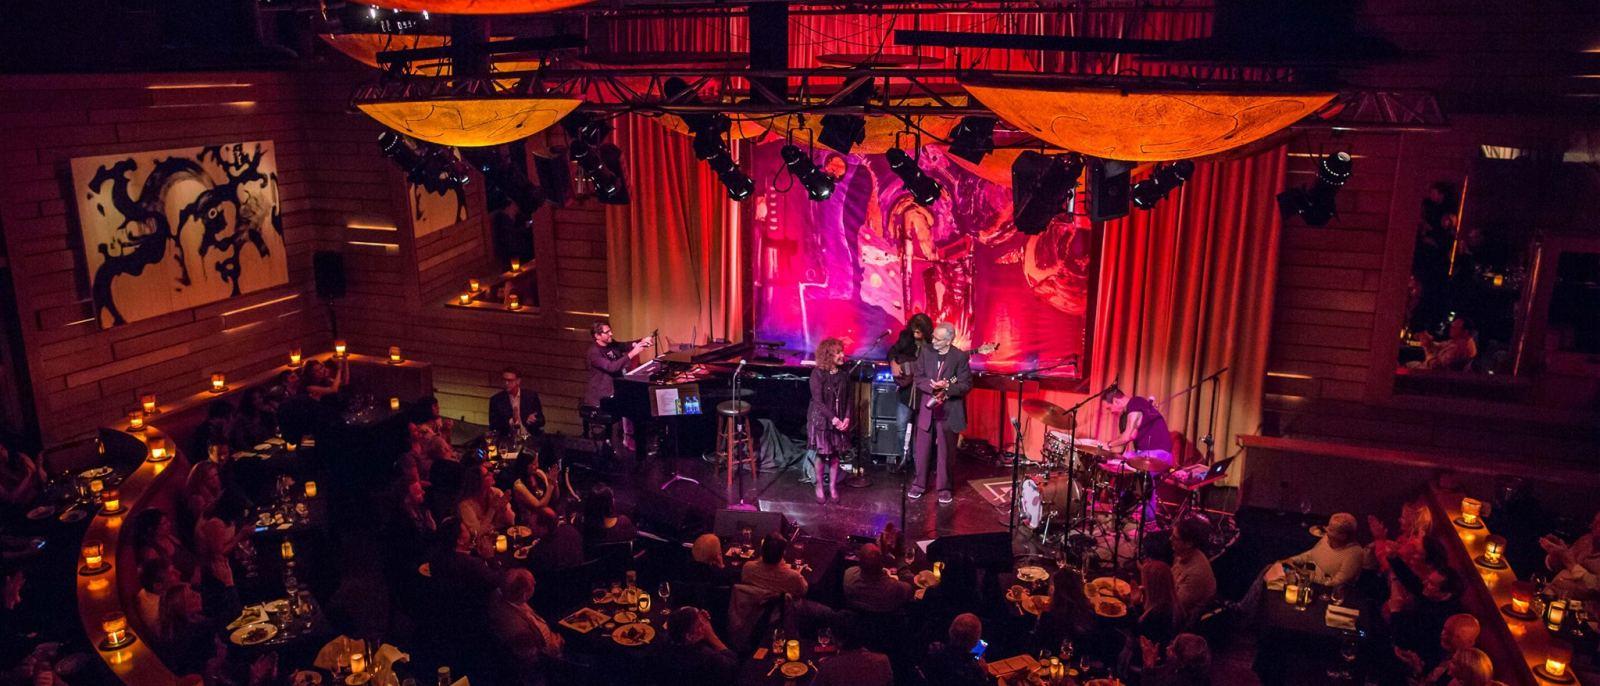 Herb Alpert and Eden Alpert on stage at Vibrato | Photo: Vibrato, Facebook